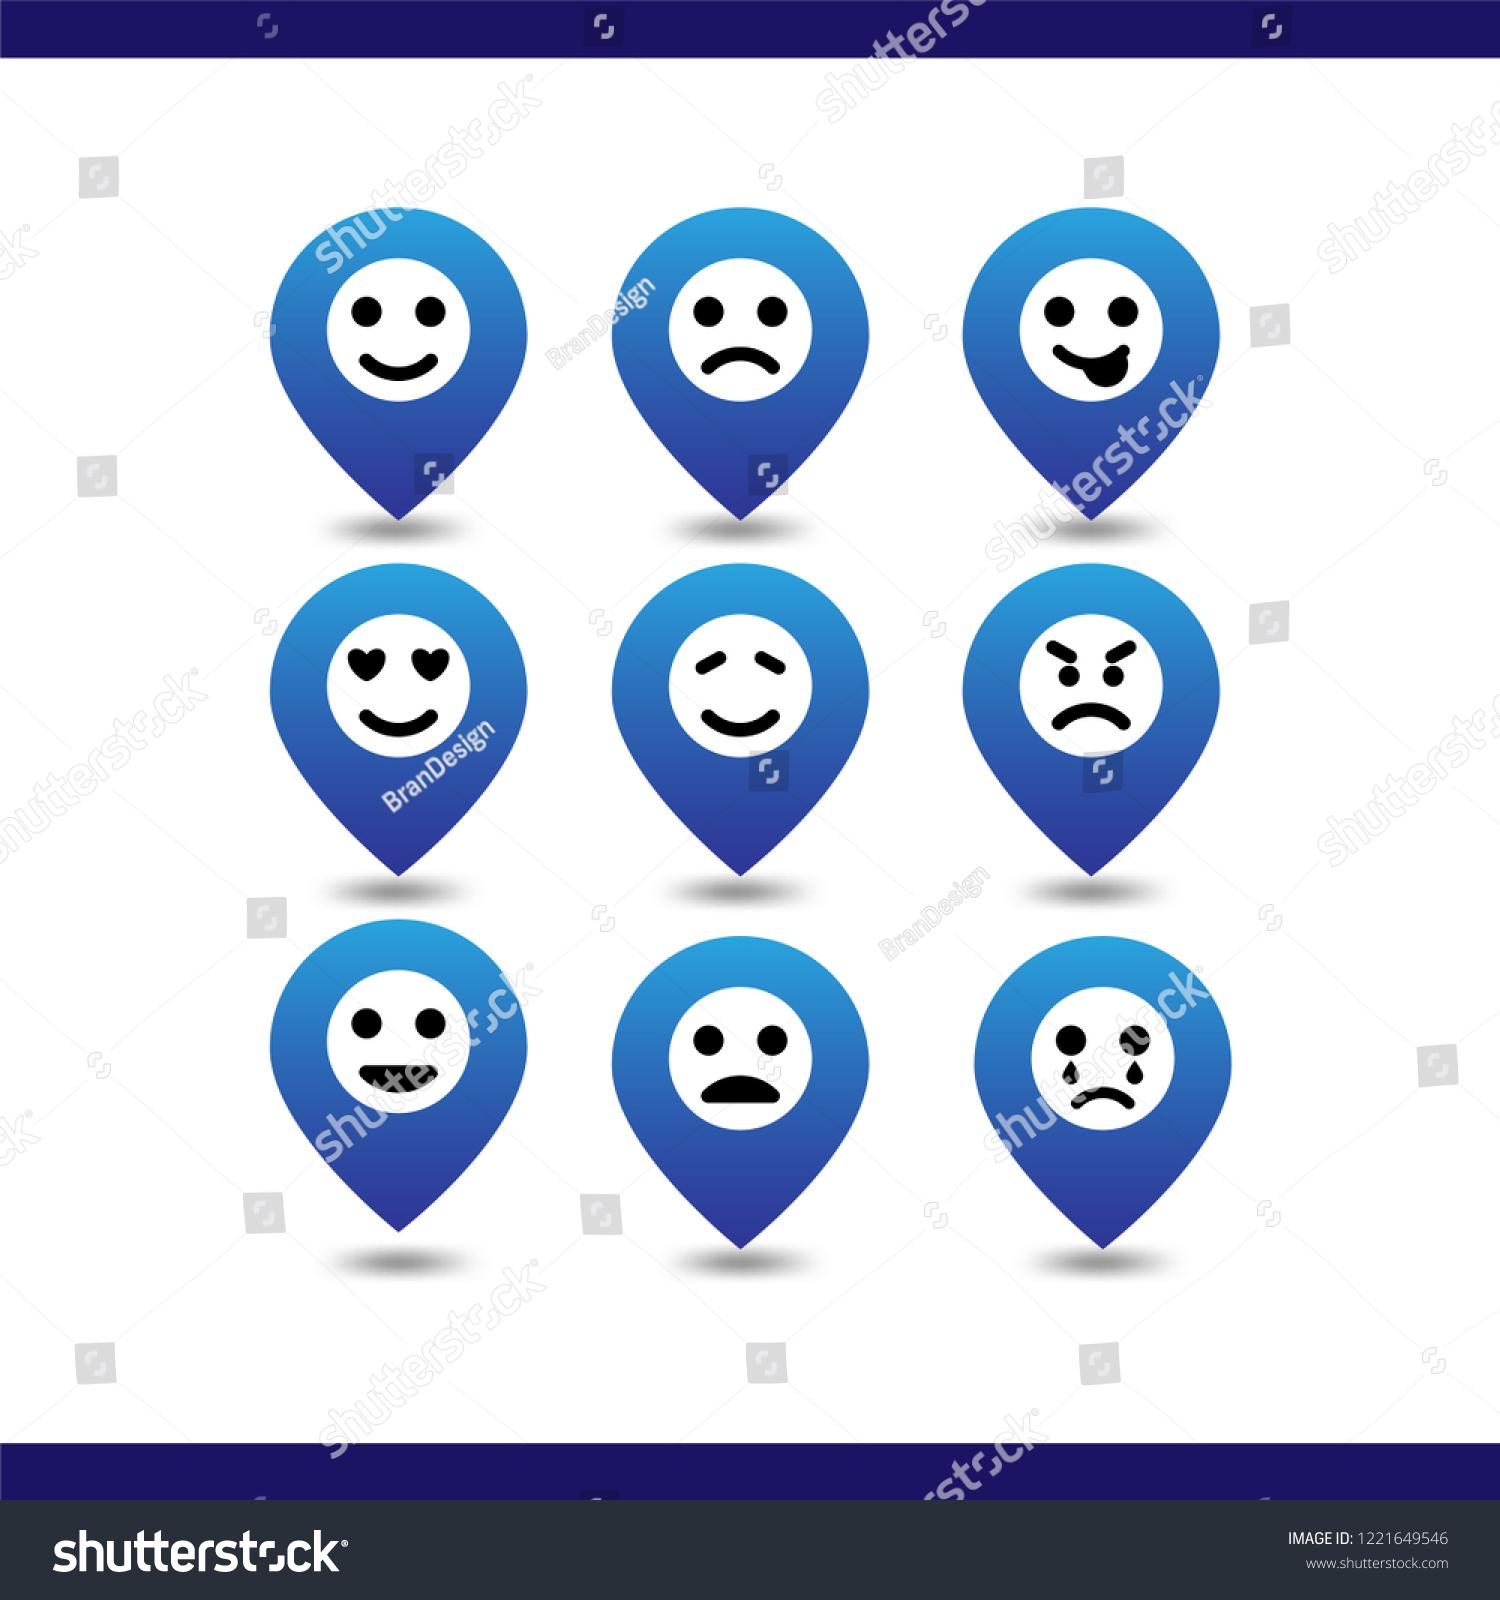 Icon Set Emoji Pin Location Expressions Stock Vector